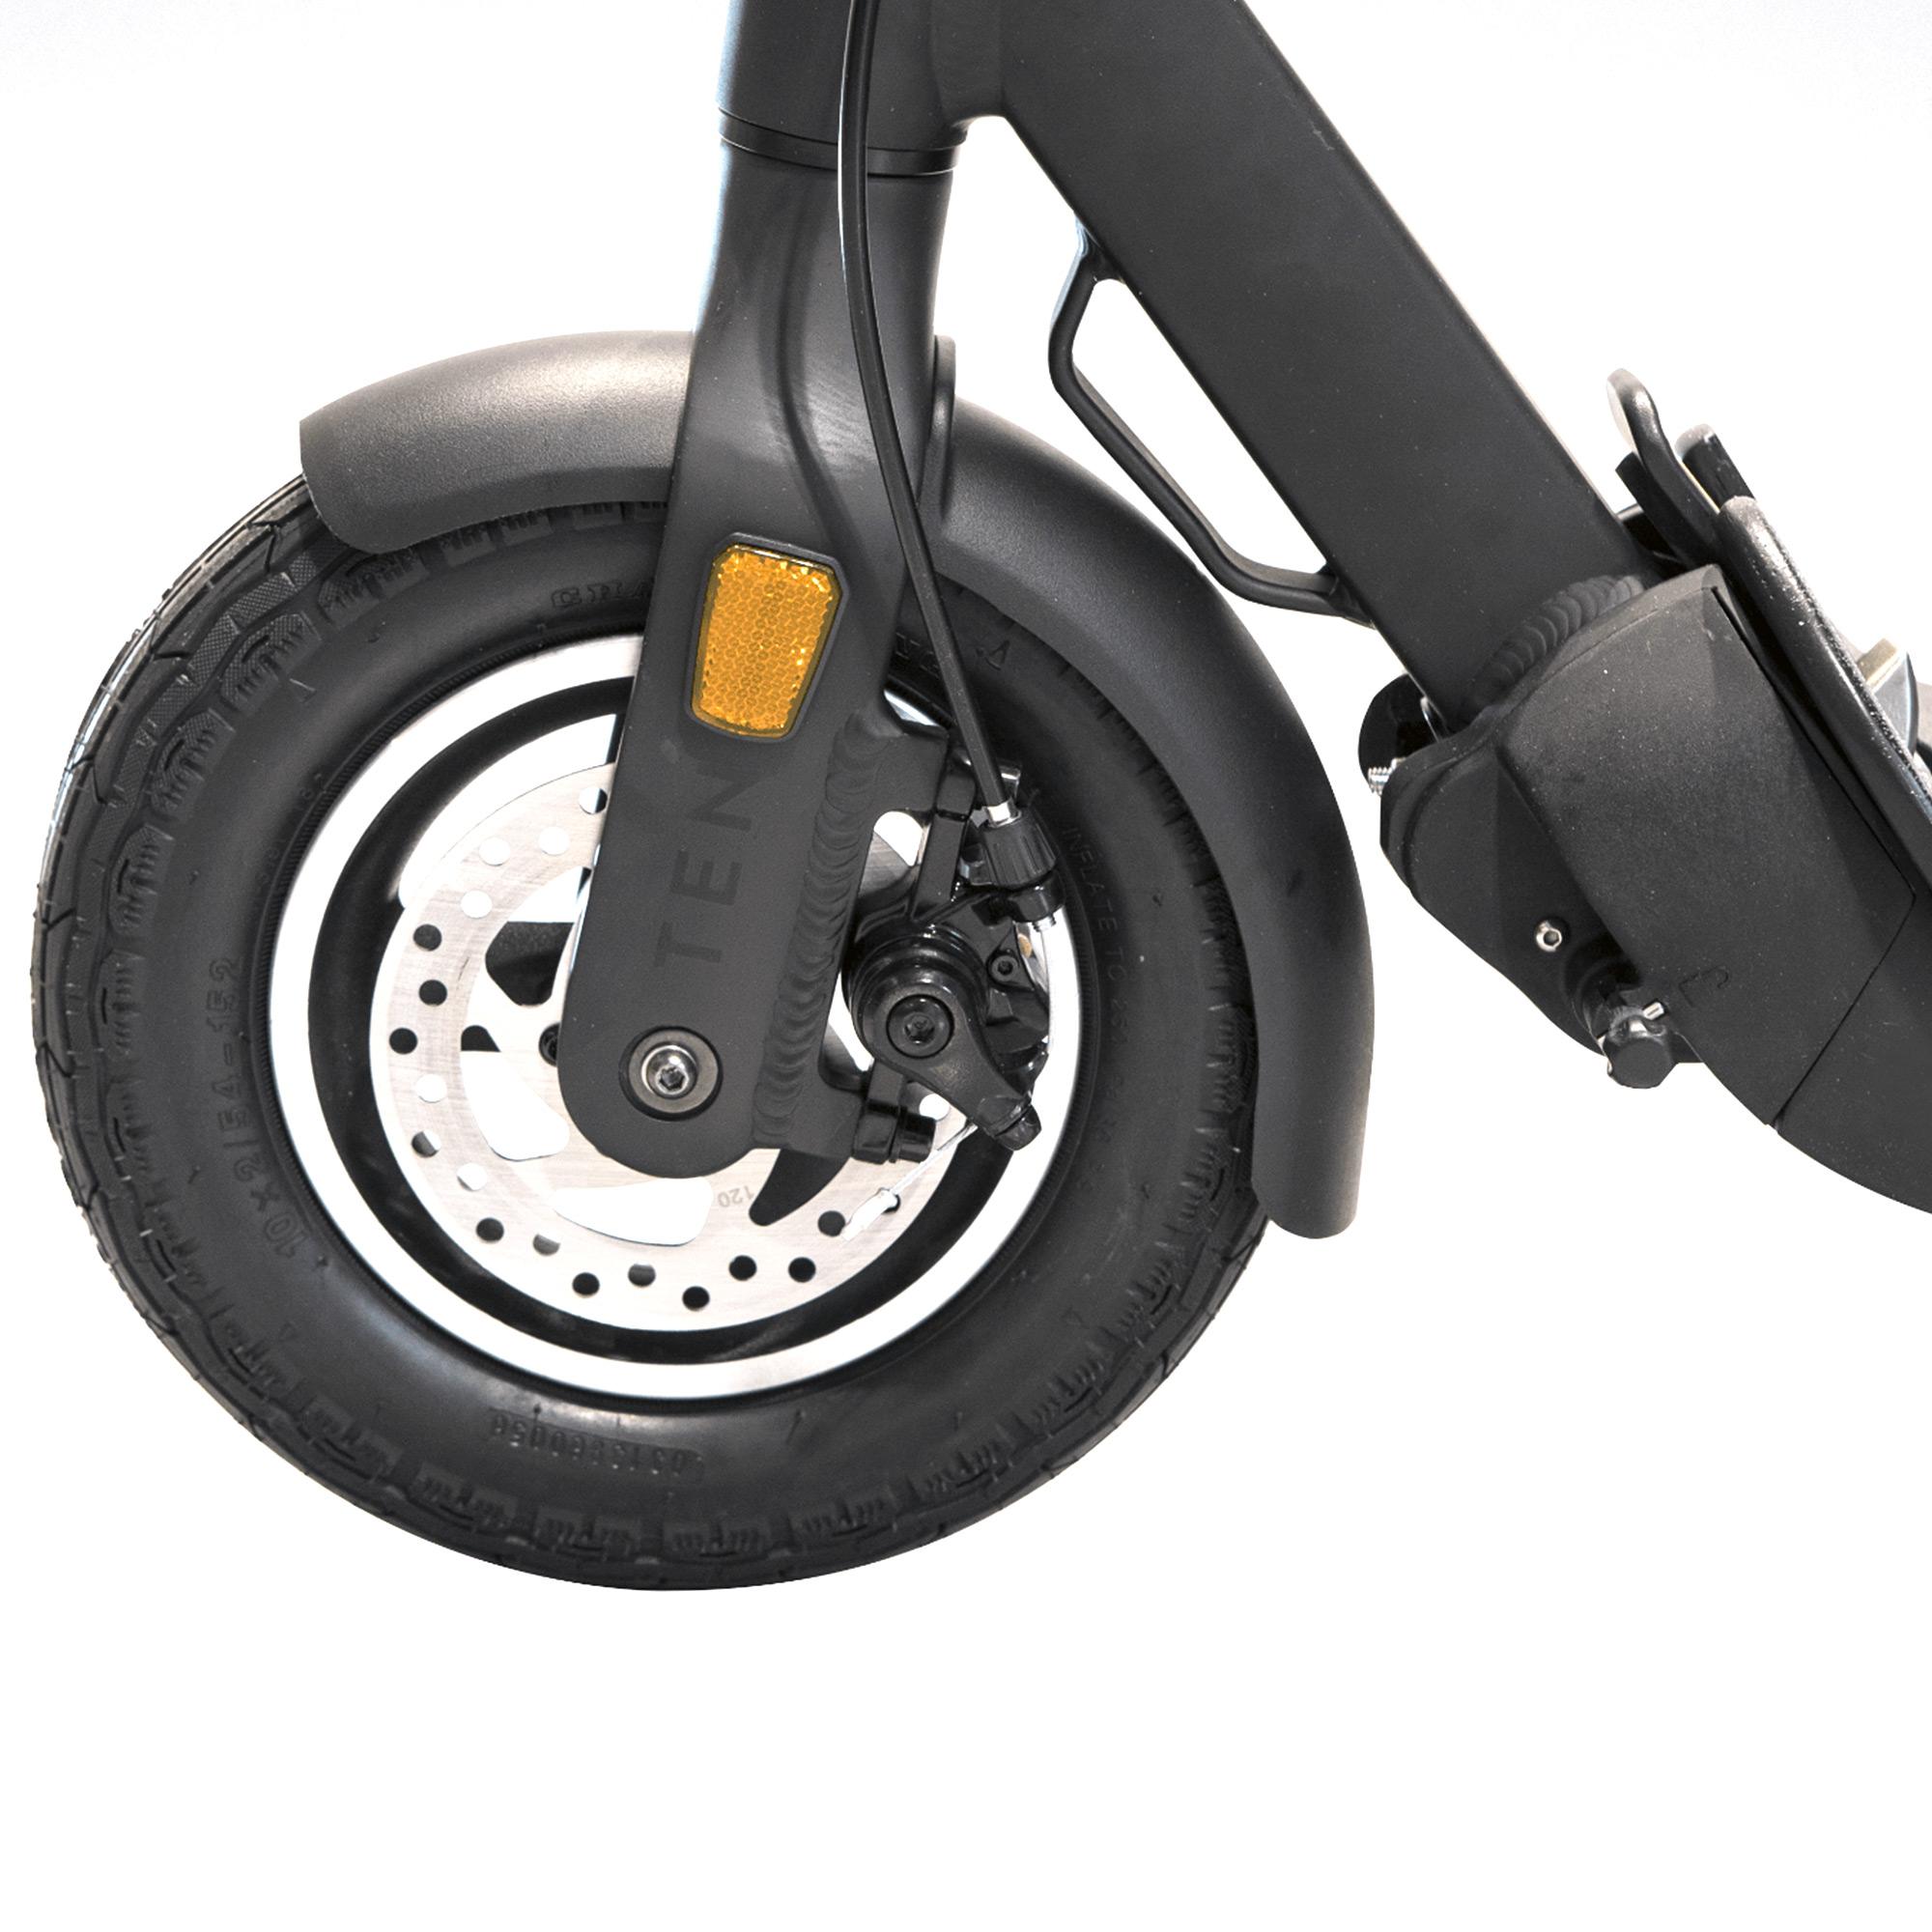 egret ten v4 special edition escooter reifen